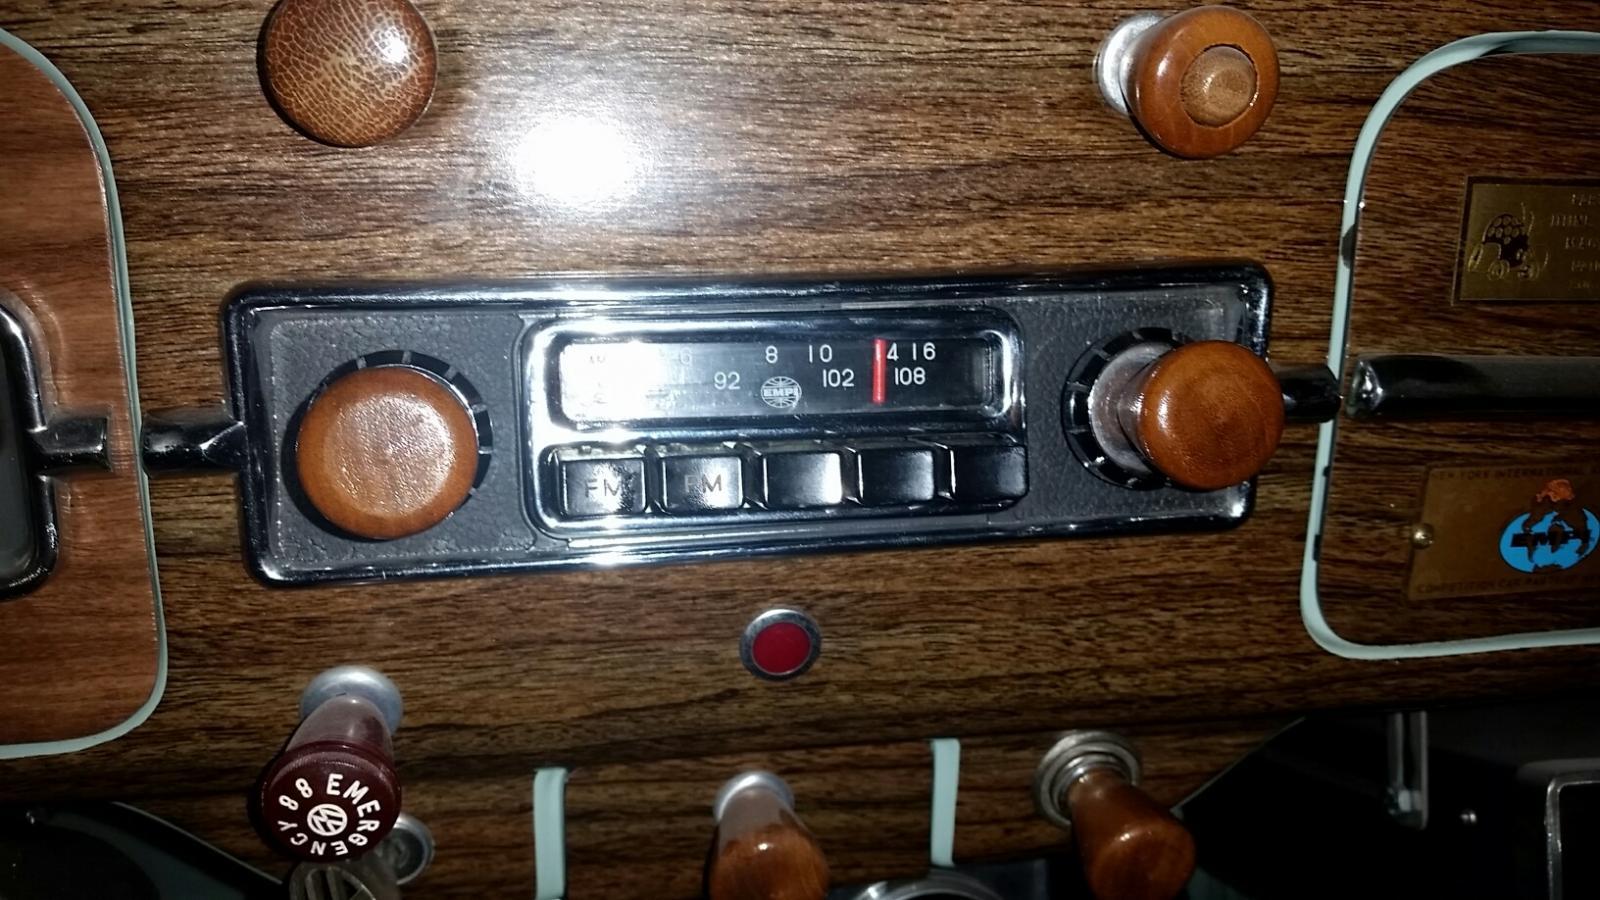 Super rare 6volt Empi AM / FM radio in my 1966 Empi GTV